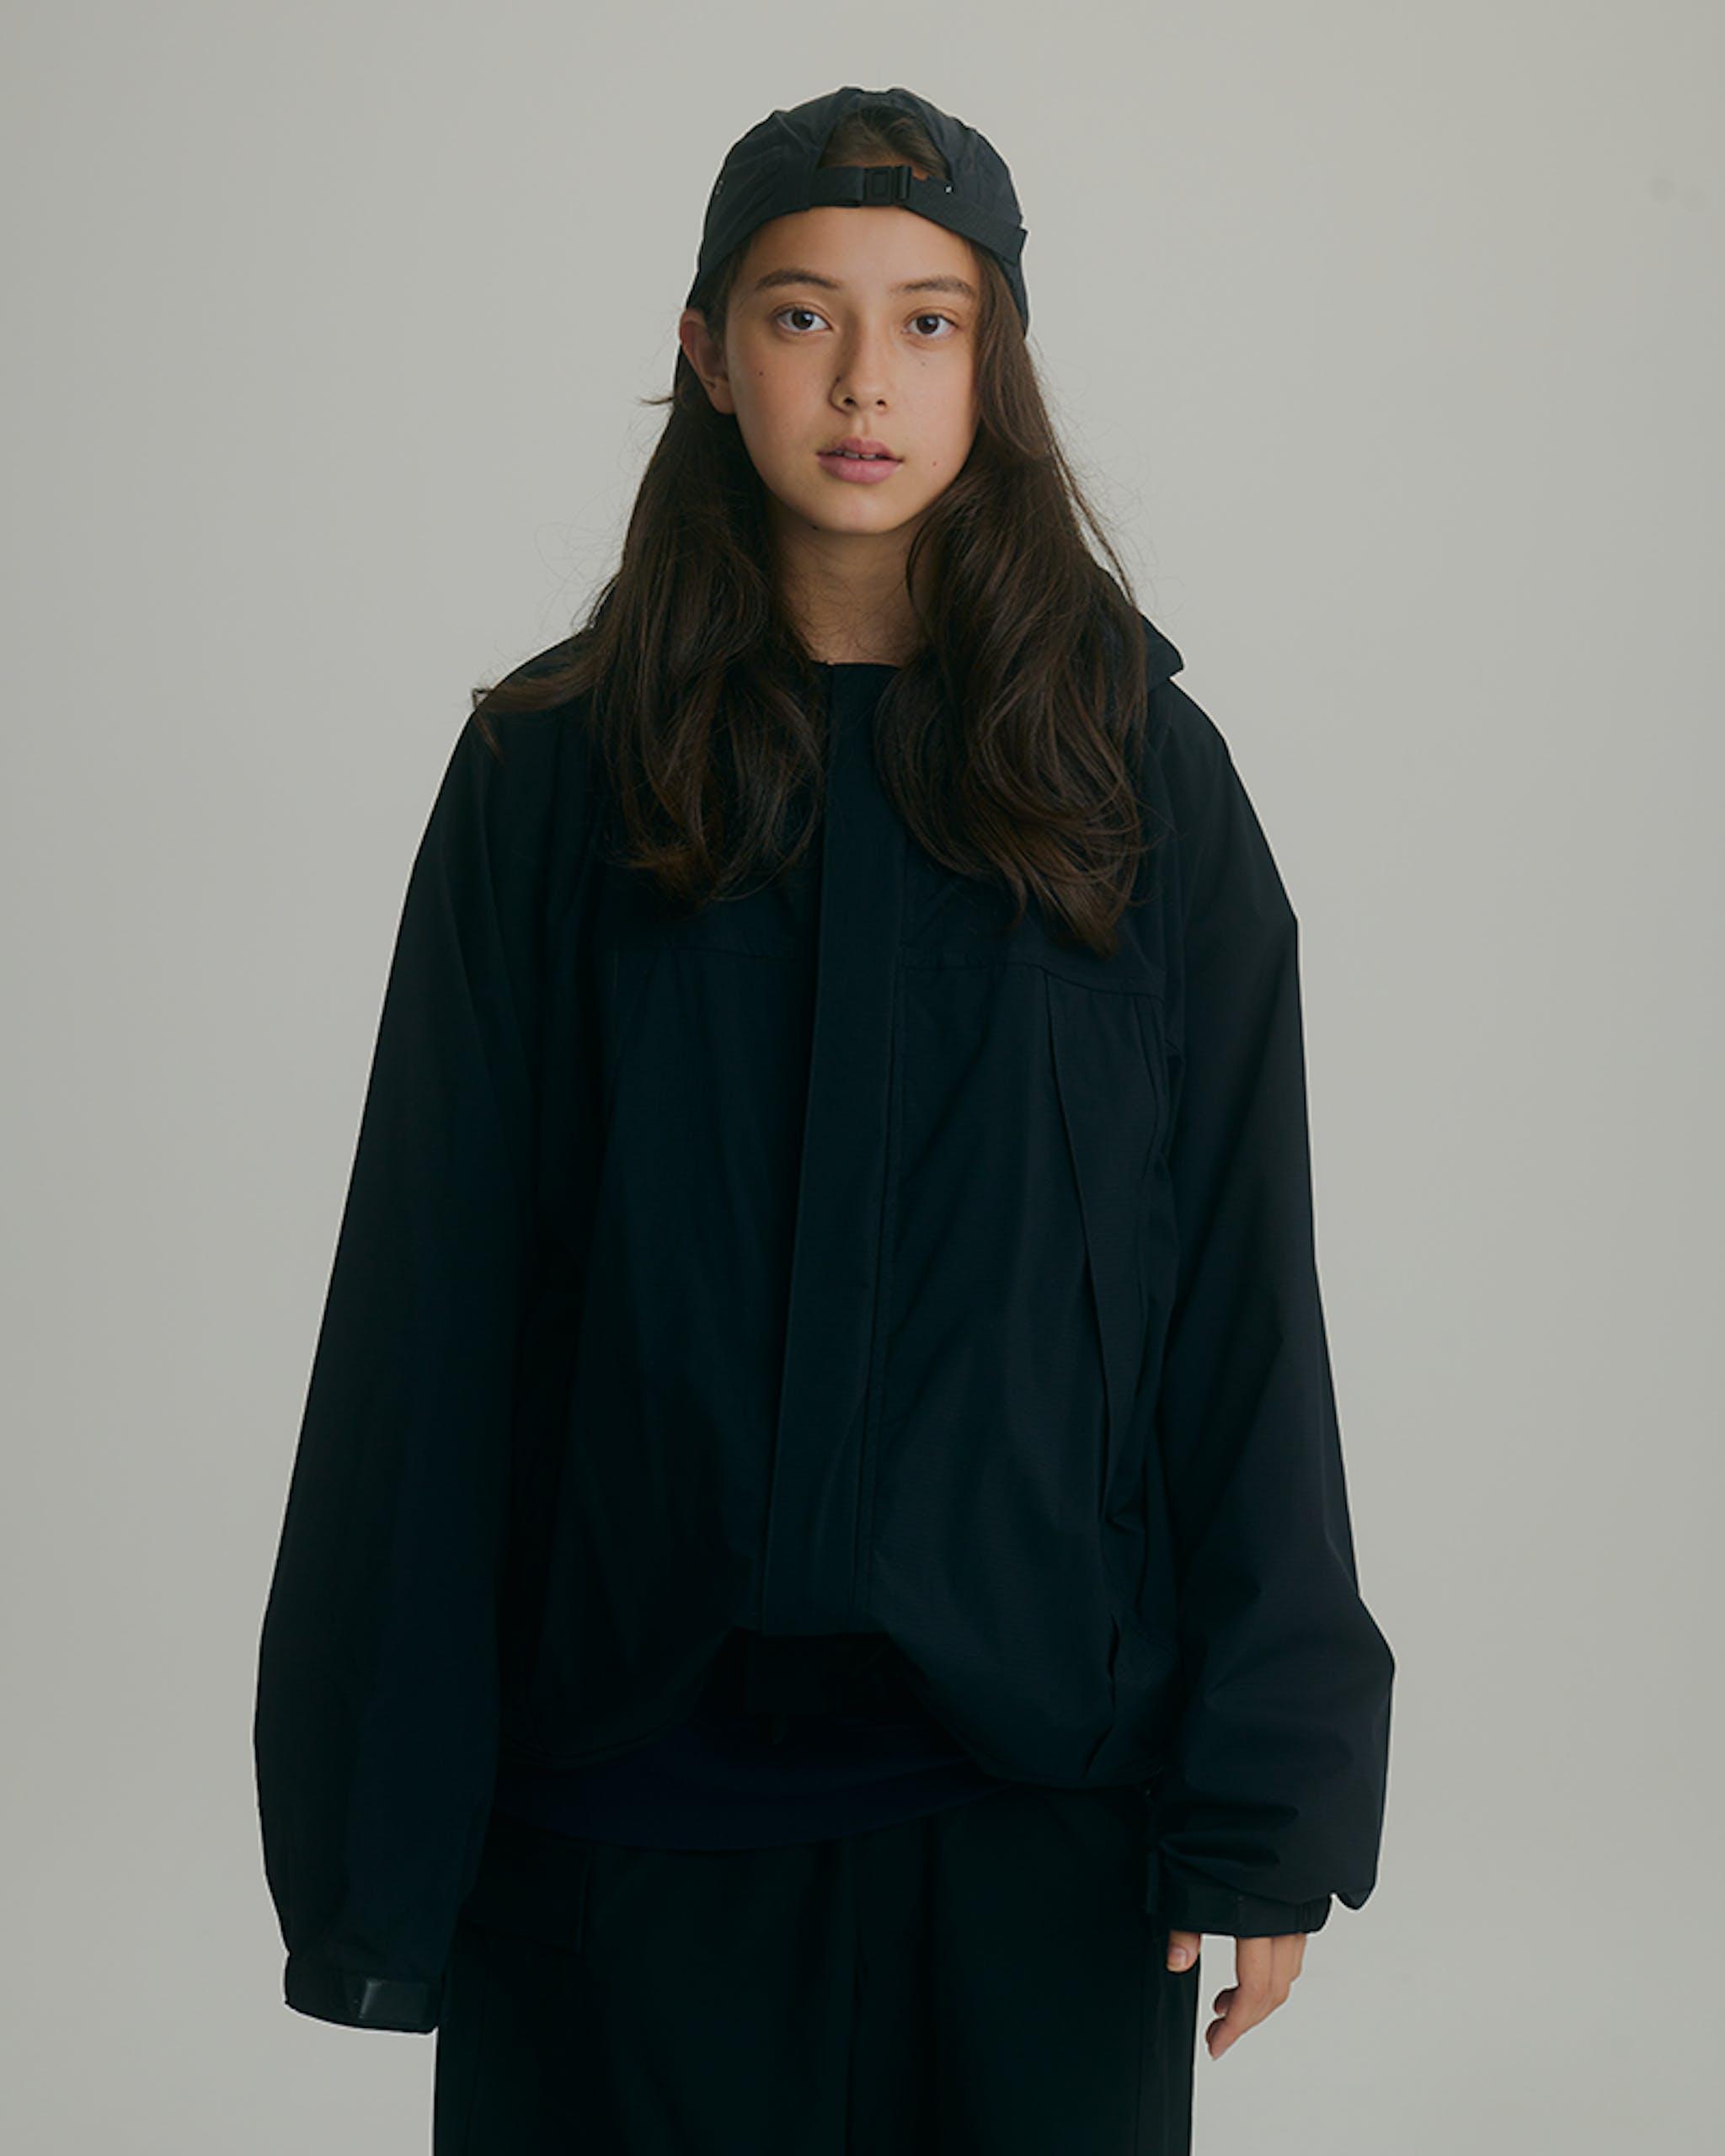 SWEAT SHIRT ¥4,840(税込) / HOODY ¥10,890(税込) / WIDE CARGO PANTS ¥9,240(税込) / CAP ¥2,640(税込)